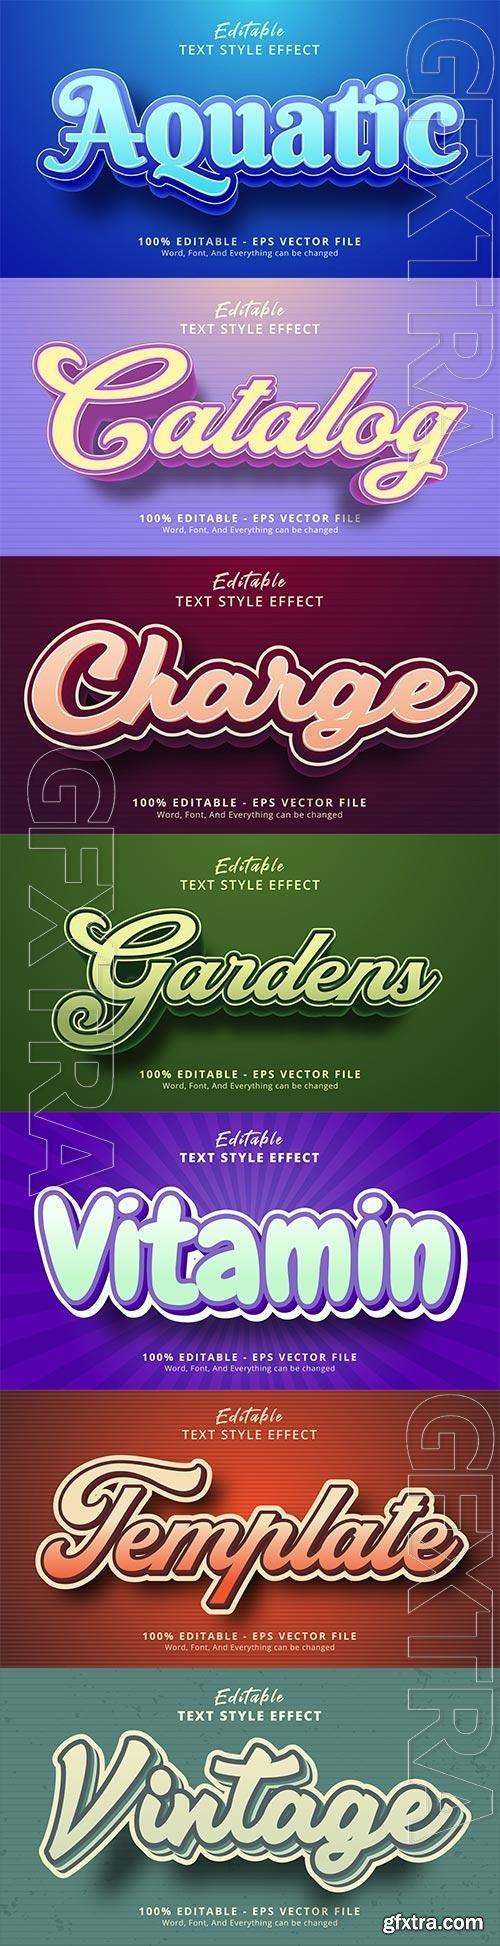 Set 3d editable text style effect vector vol 161